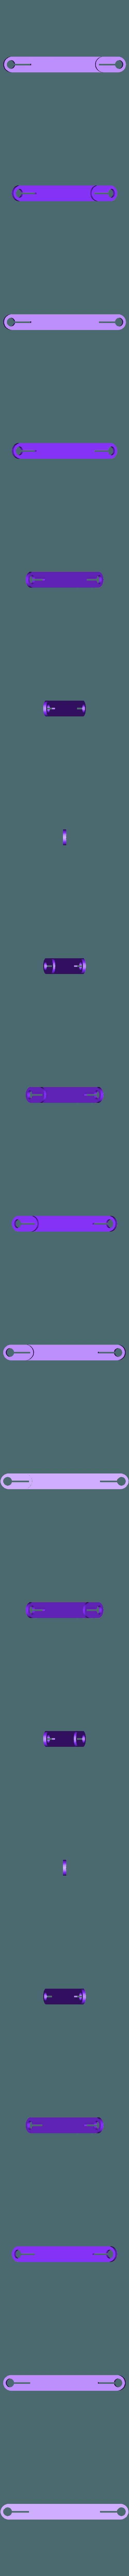 8cm_Strap_Holes.stl Download free STL file Flexible Filament Bikini Top and Bottom • 3D printable design, SexyCyborg